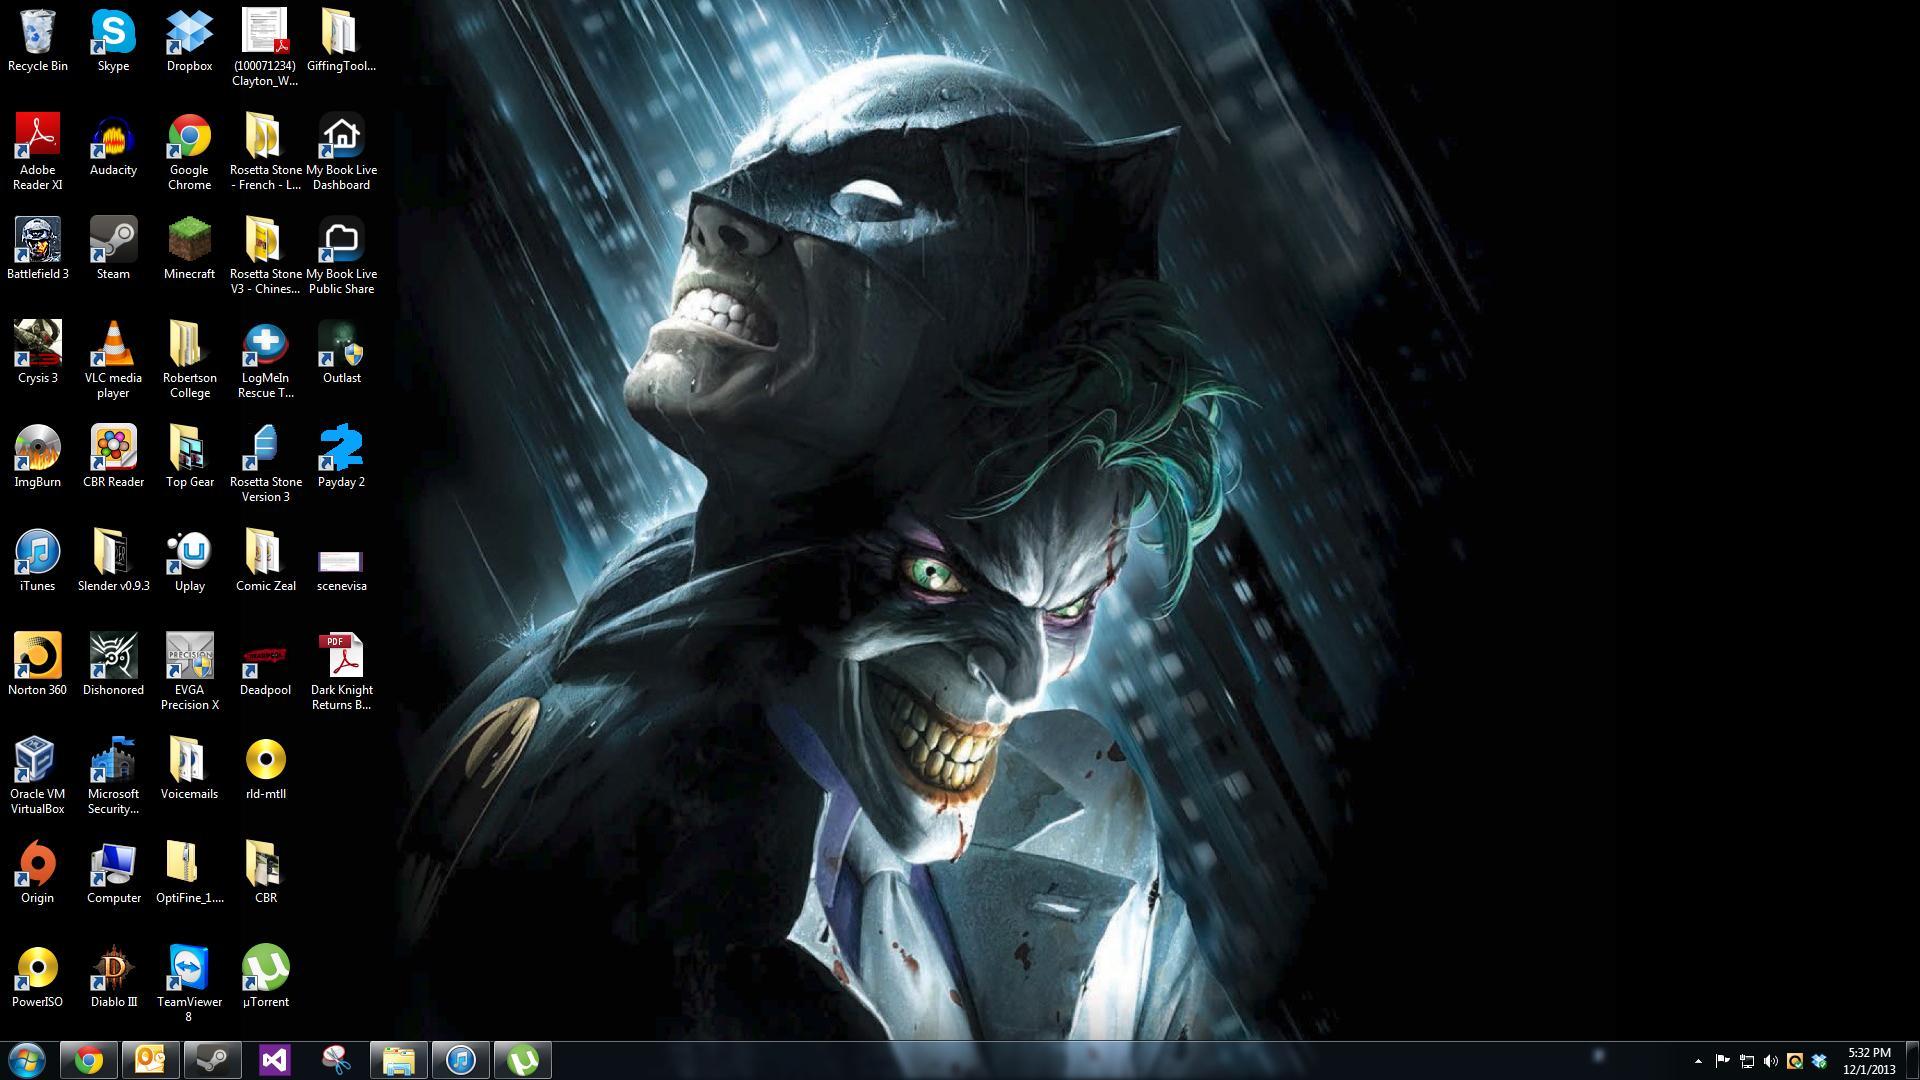 Dark Knight Returns Wallpaper - WallpaperSafari